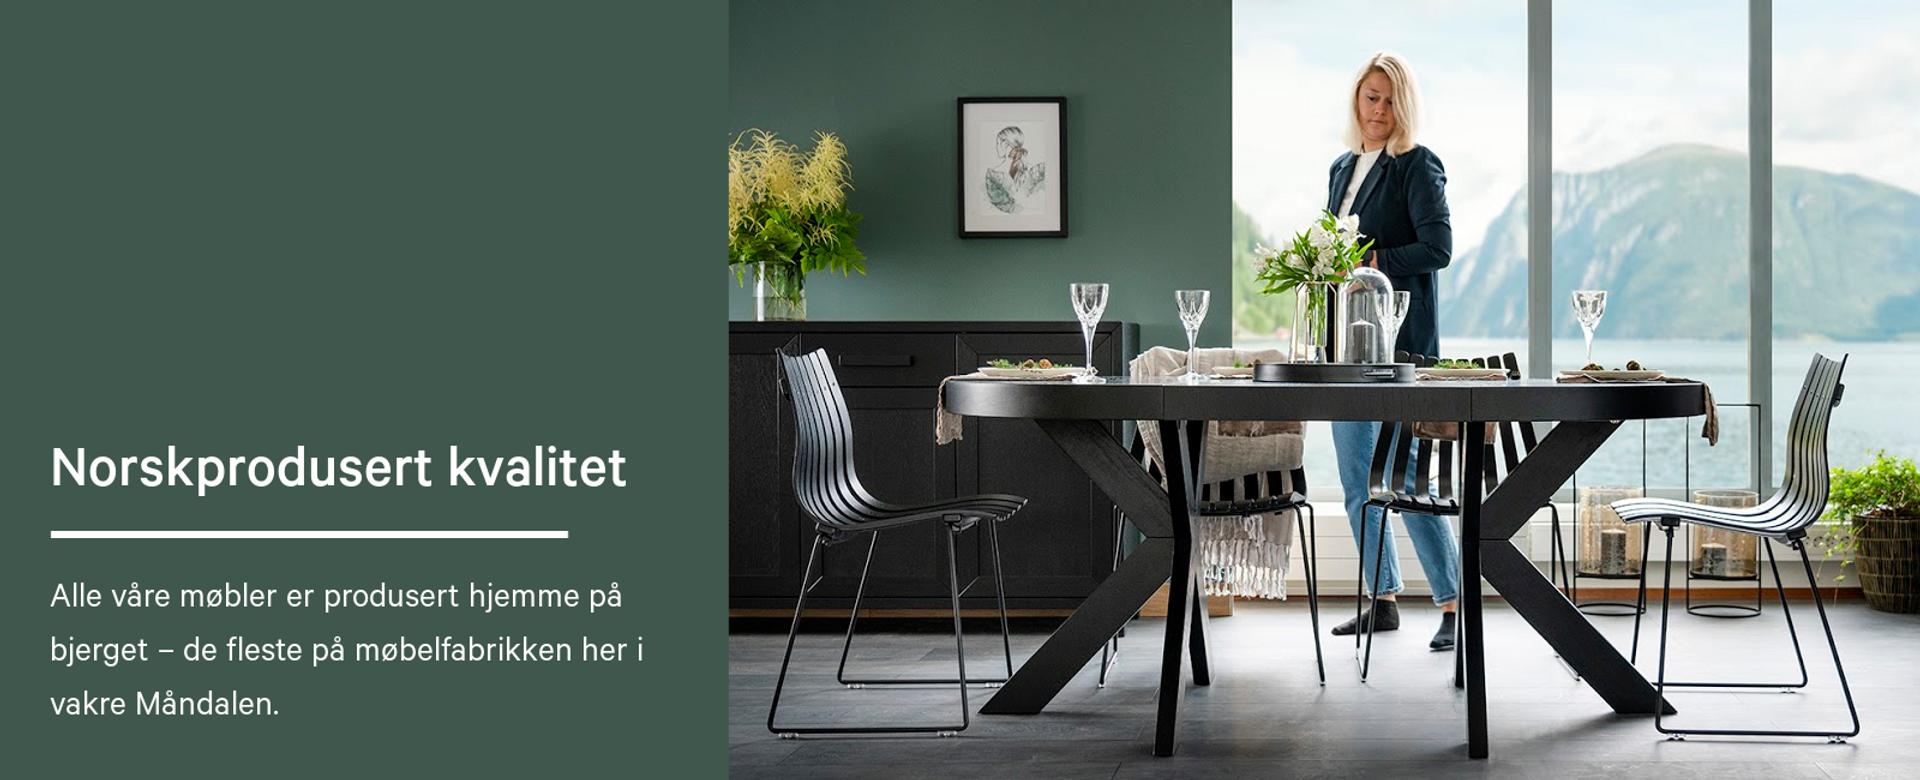 Norskprodusert kvalitet. Alle våre møbler er produsert hjemme på bjerget – de fleste på møbelfabrikken her i vakre Måndalen.